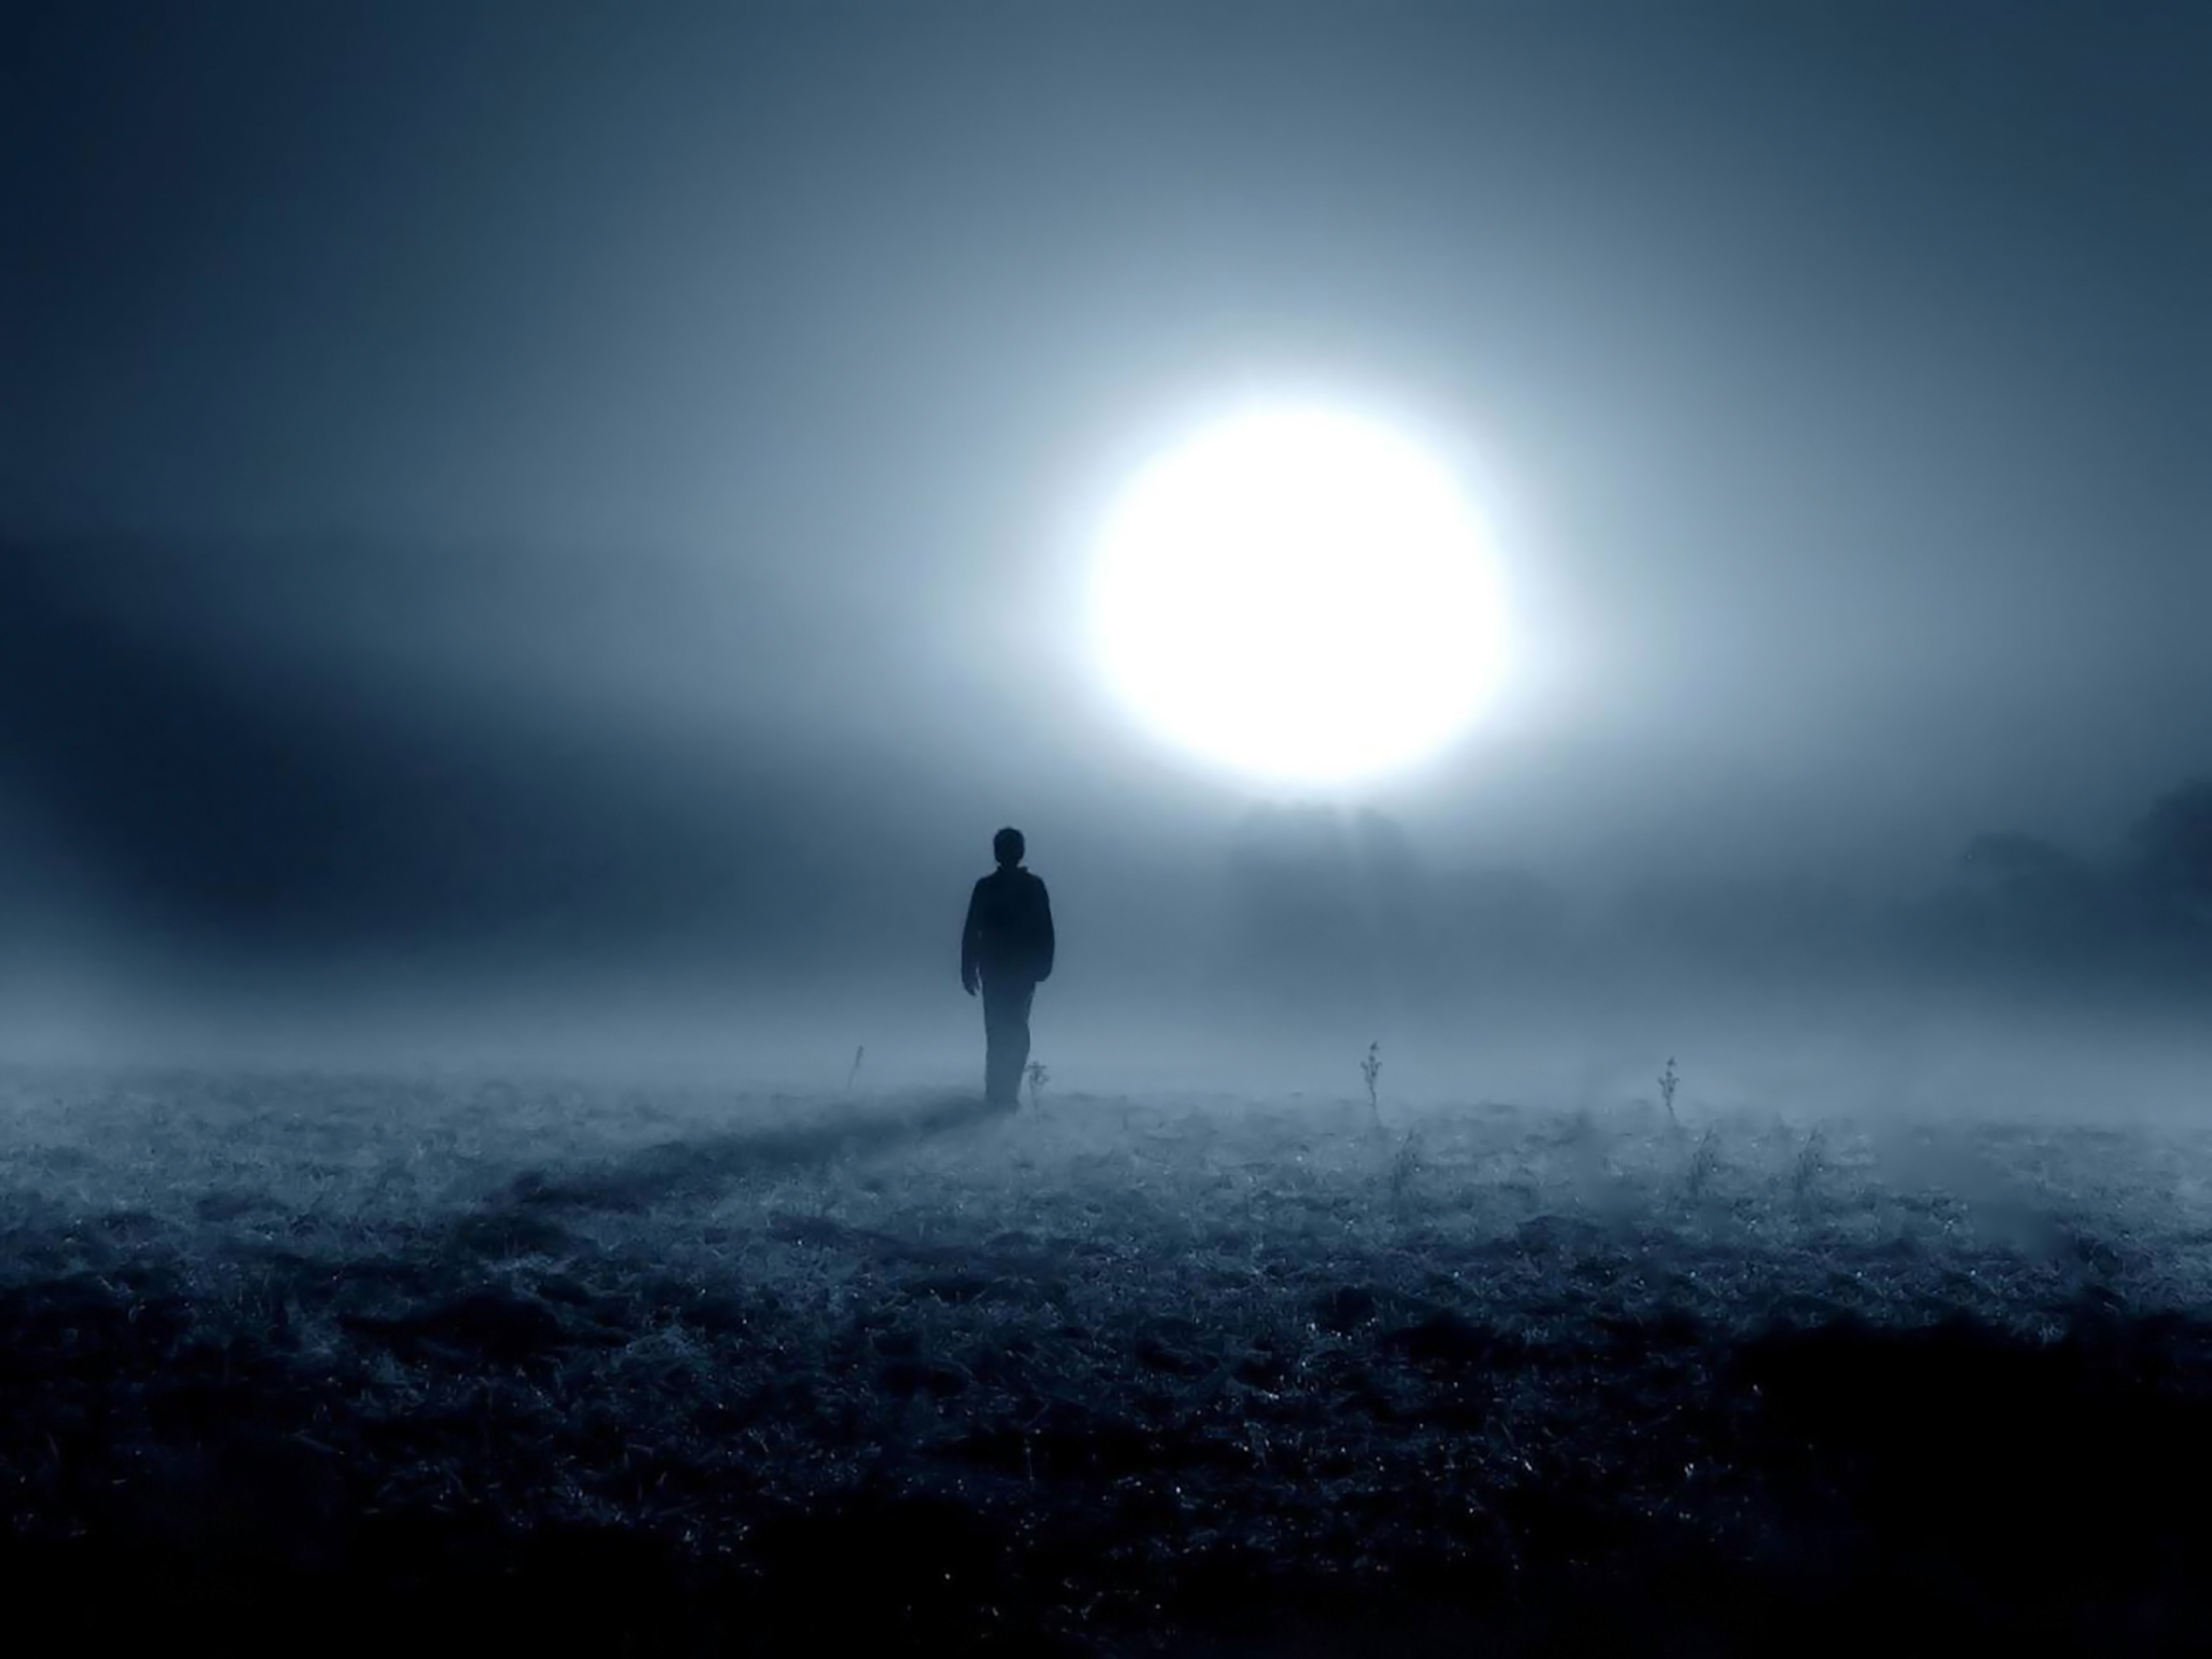 The light behind the dark